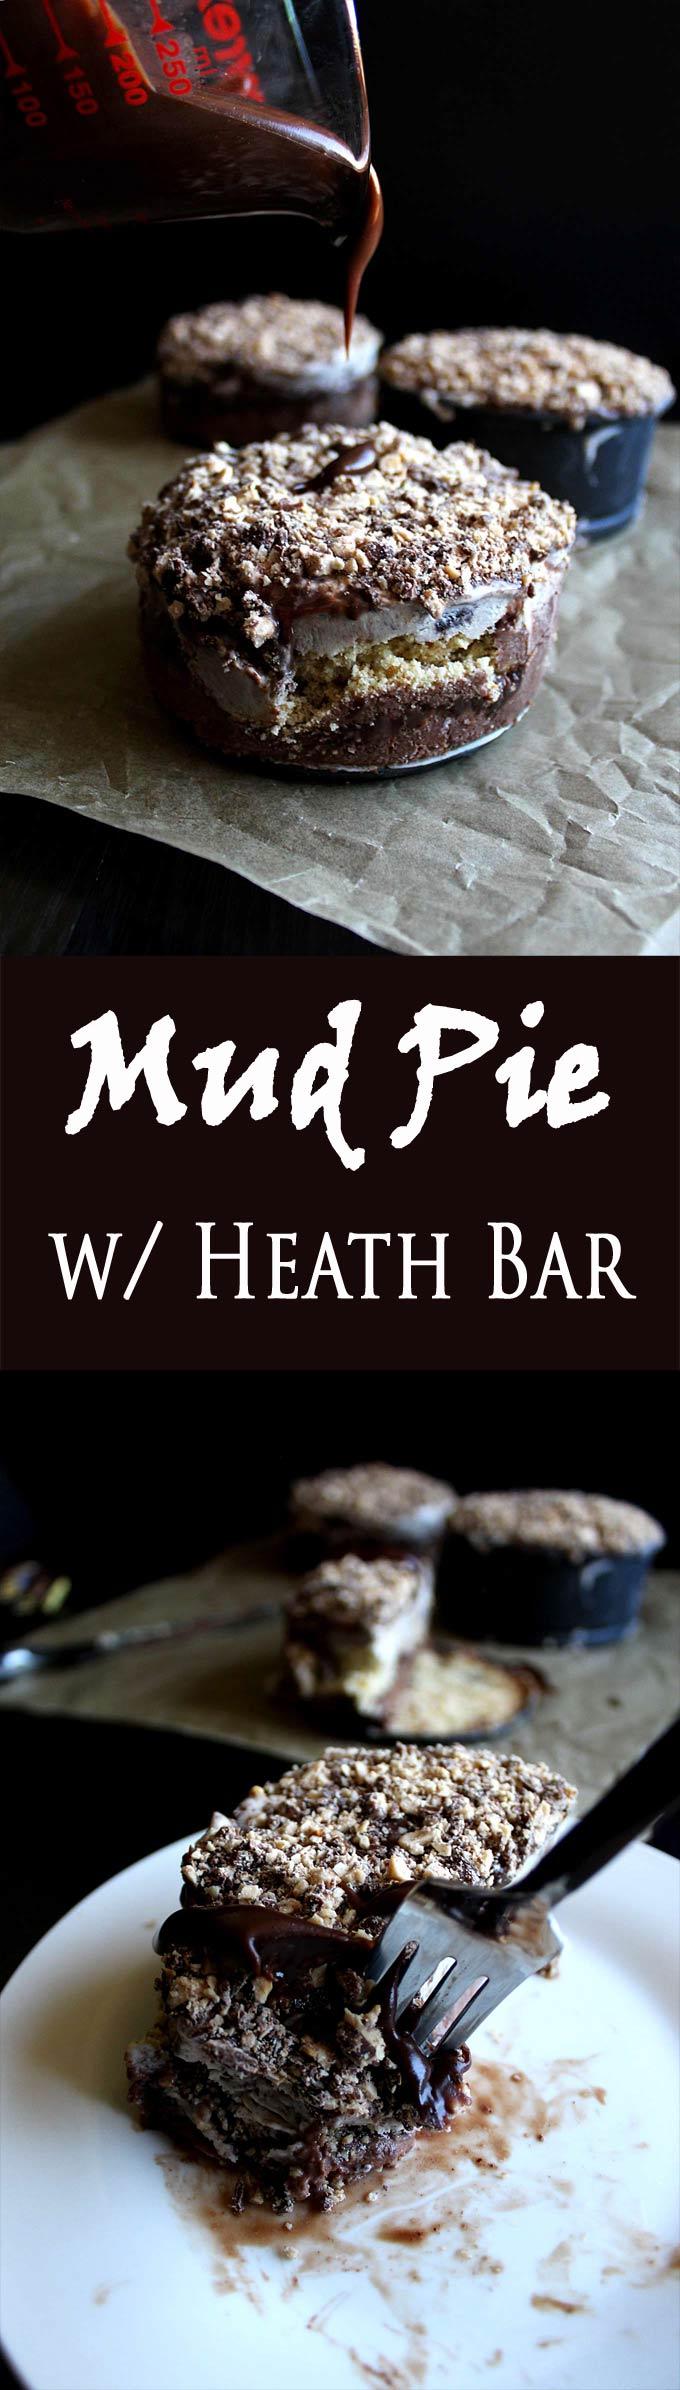 Mud Pie Recipe | Heath Bar | Ice Cream | Crushed Cookies | Homemade Hot Fudge | Dessert